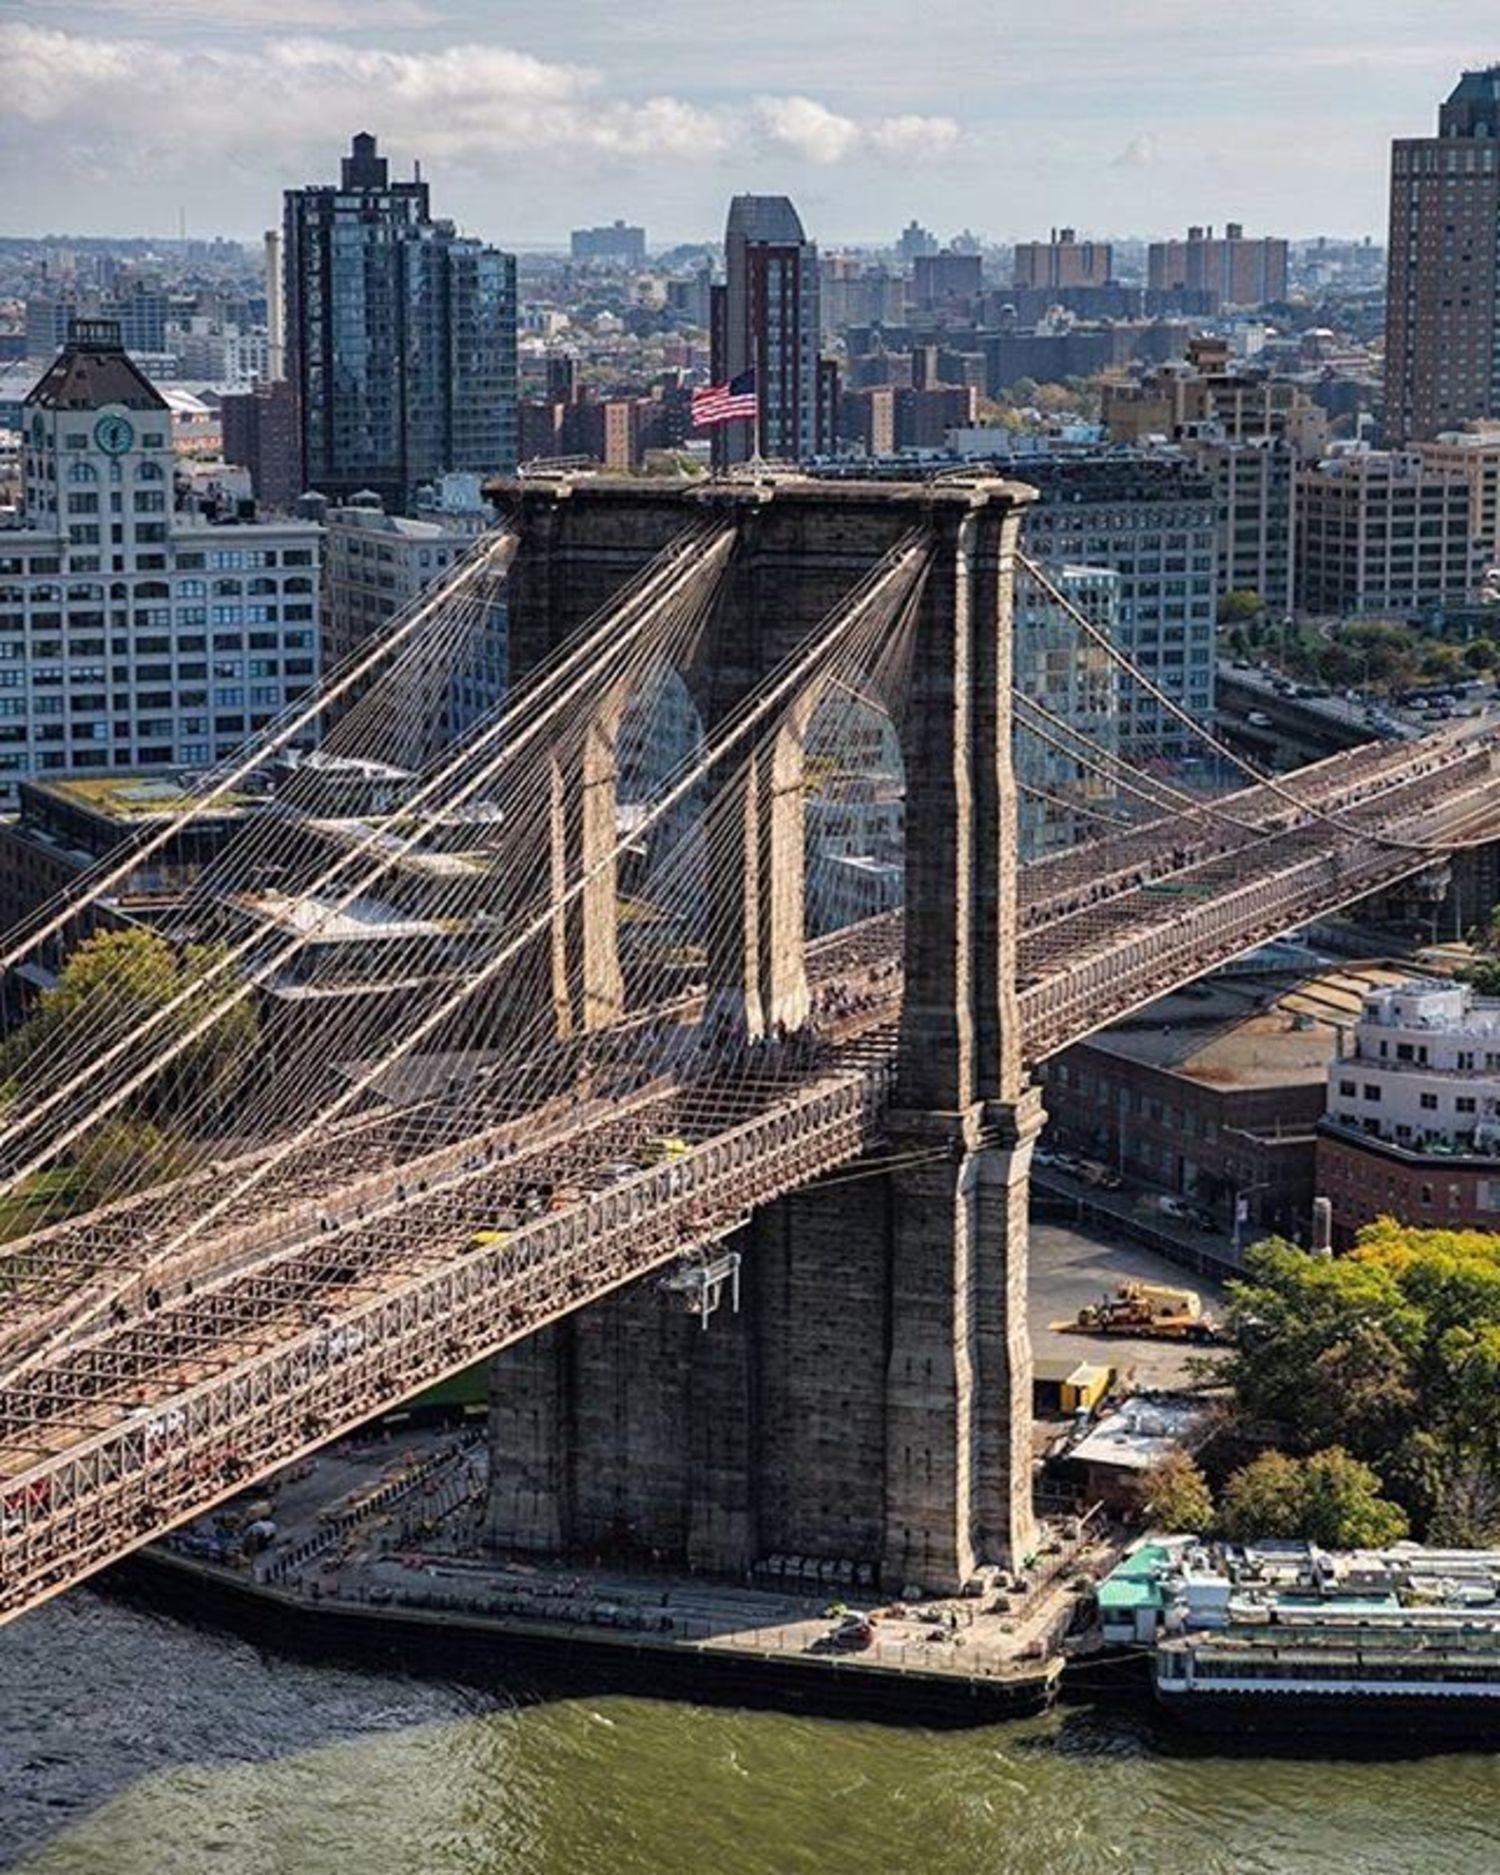 Brooklyn Bridge, New York, New York. Photo via @mattpugs #viewingnyc #newyorkcity #newyork #nyc